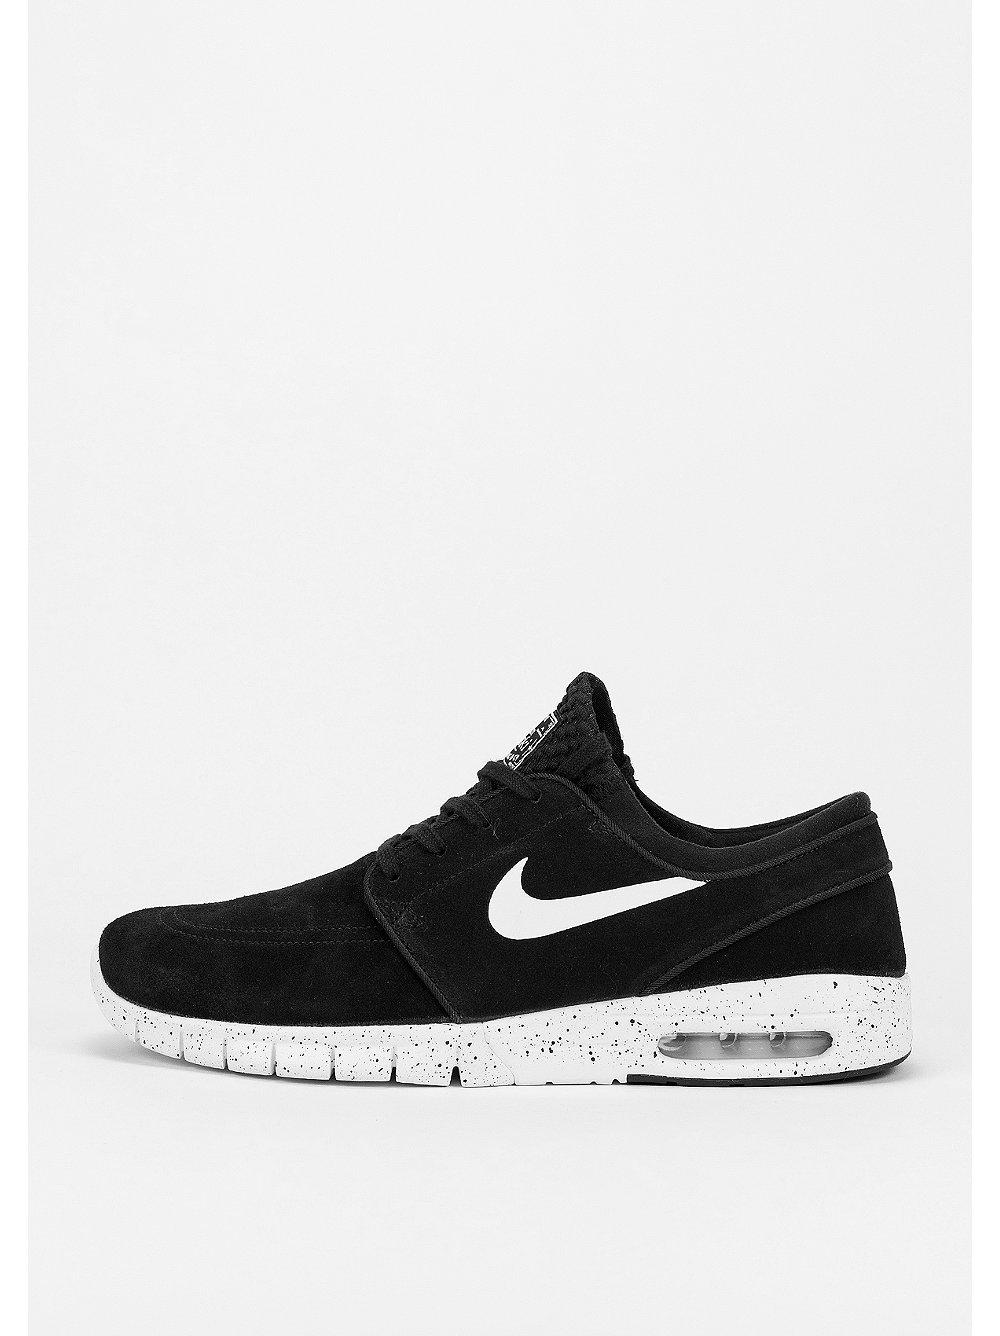 san francisco c5138 67255 Beste Qualität Nike SB Stefan Janoski MAX Gr.41 Schuhe